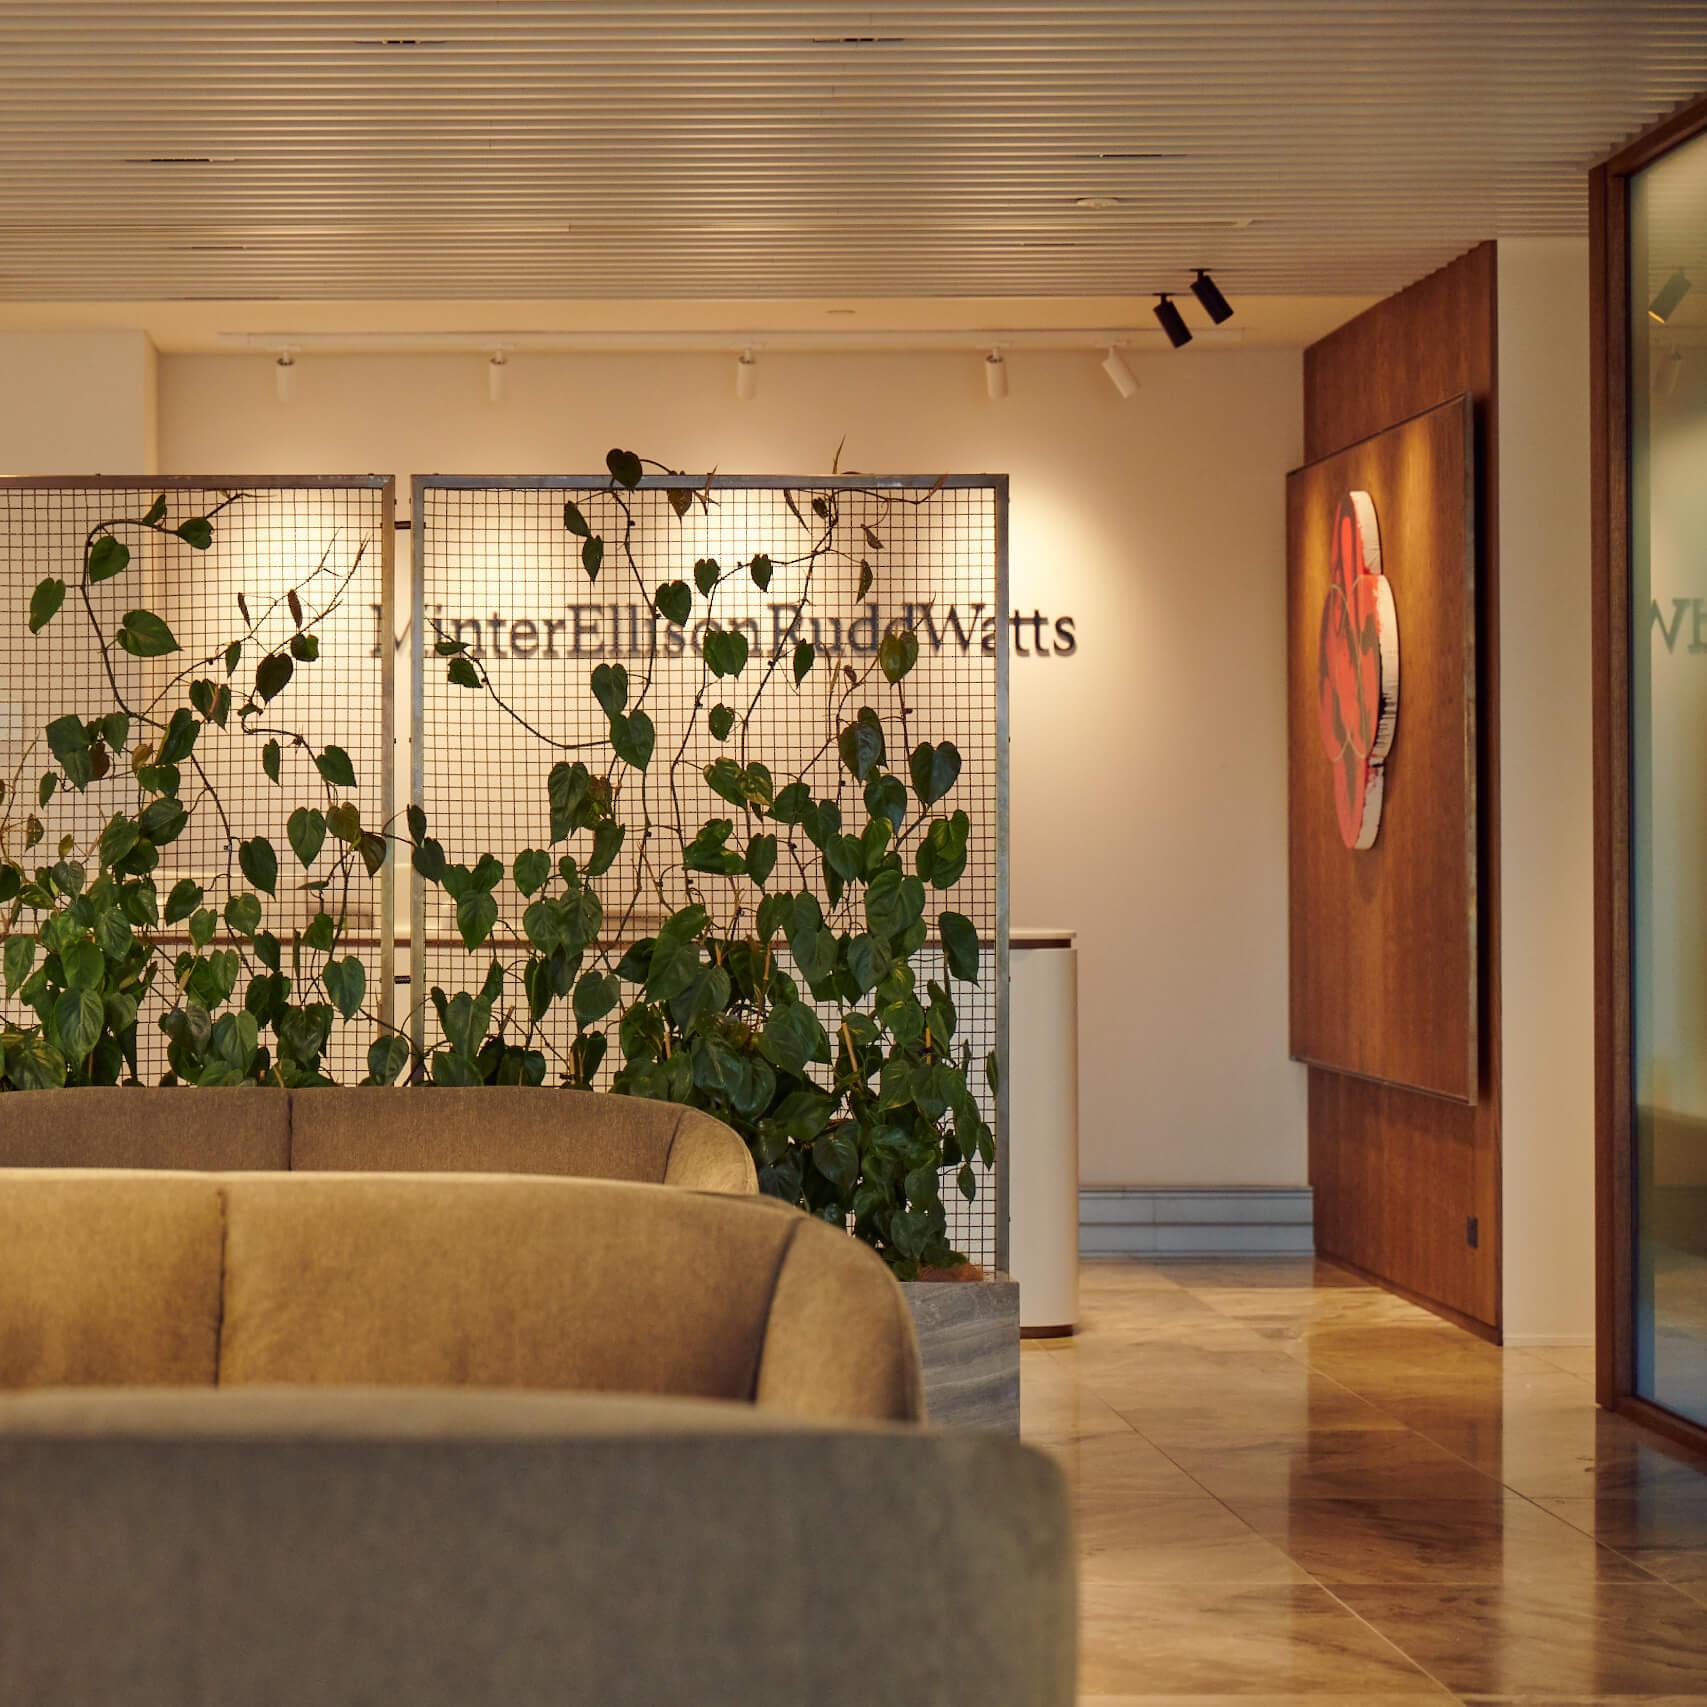 portfolio-offices-spaces-minterellison-image2